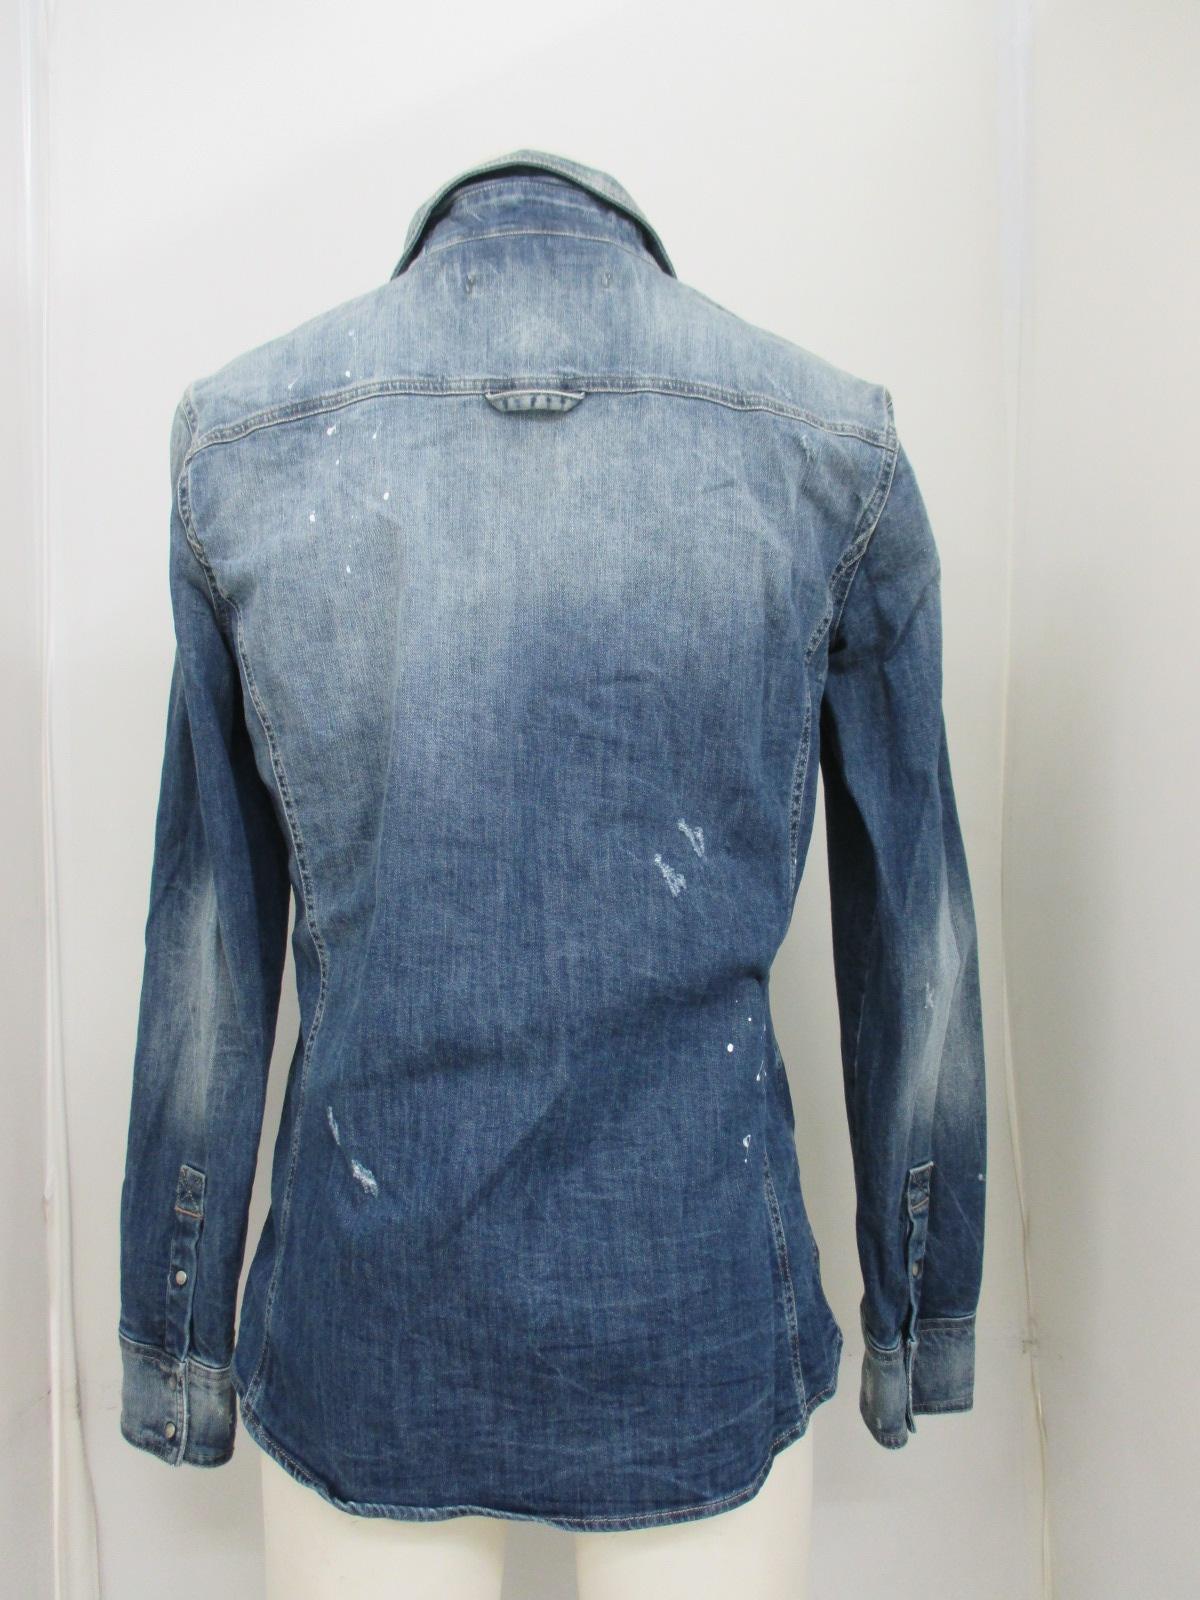 ABSOLUT JOY(アブソリュートジョイ)のシャツ